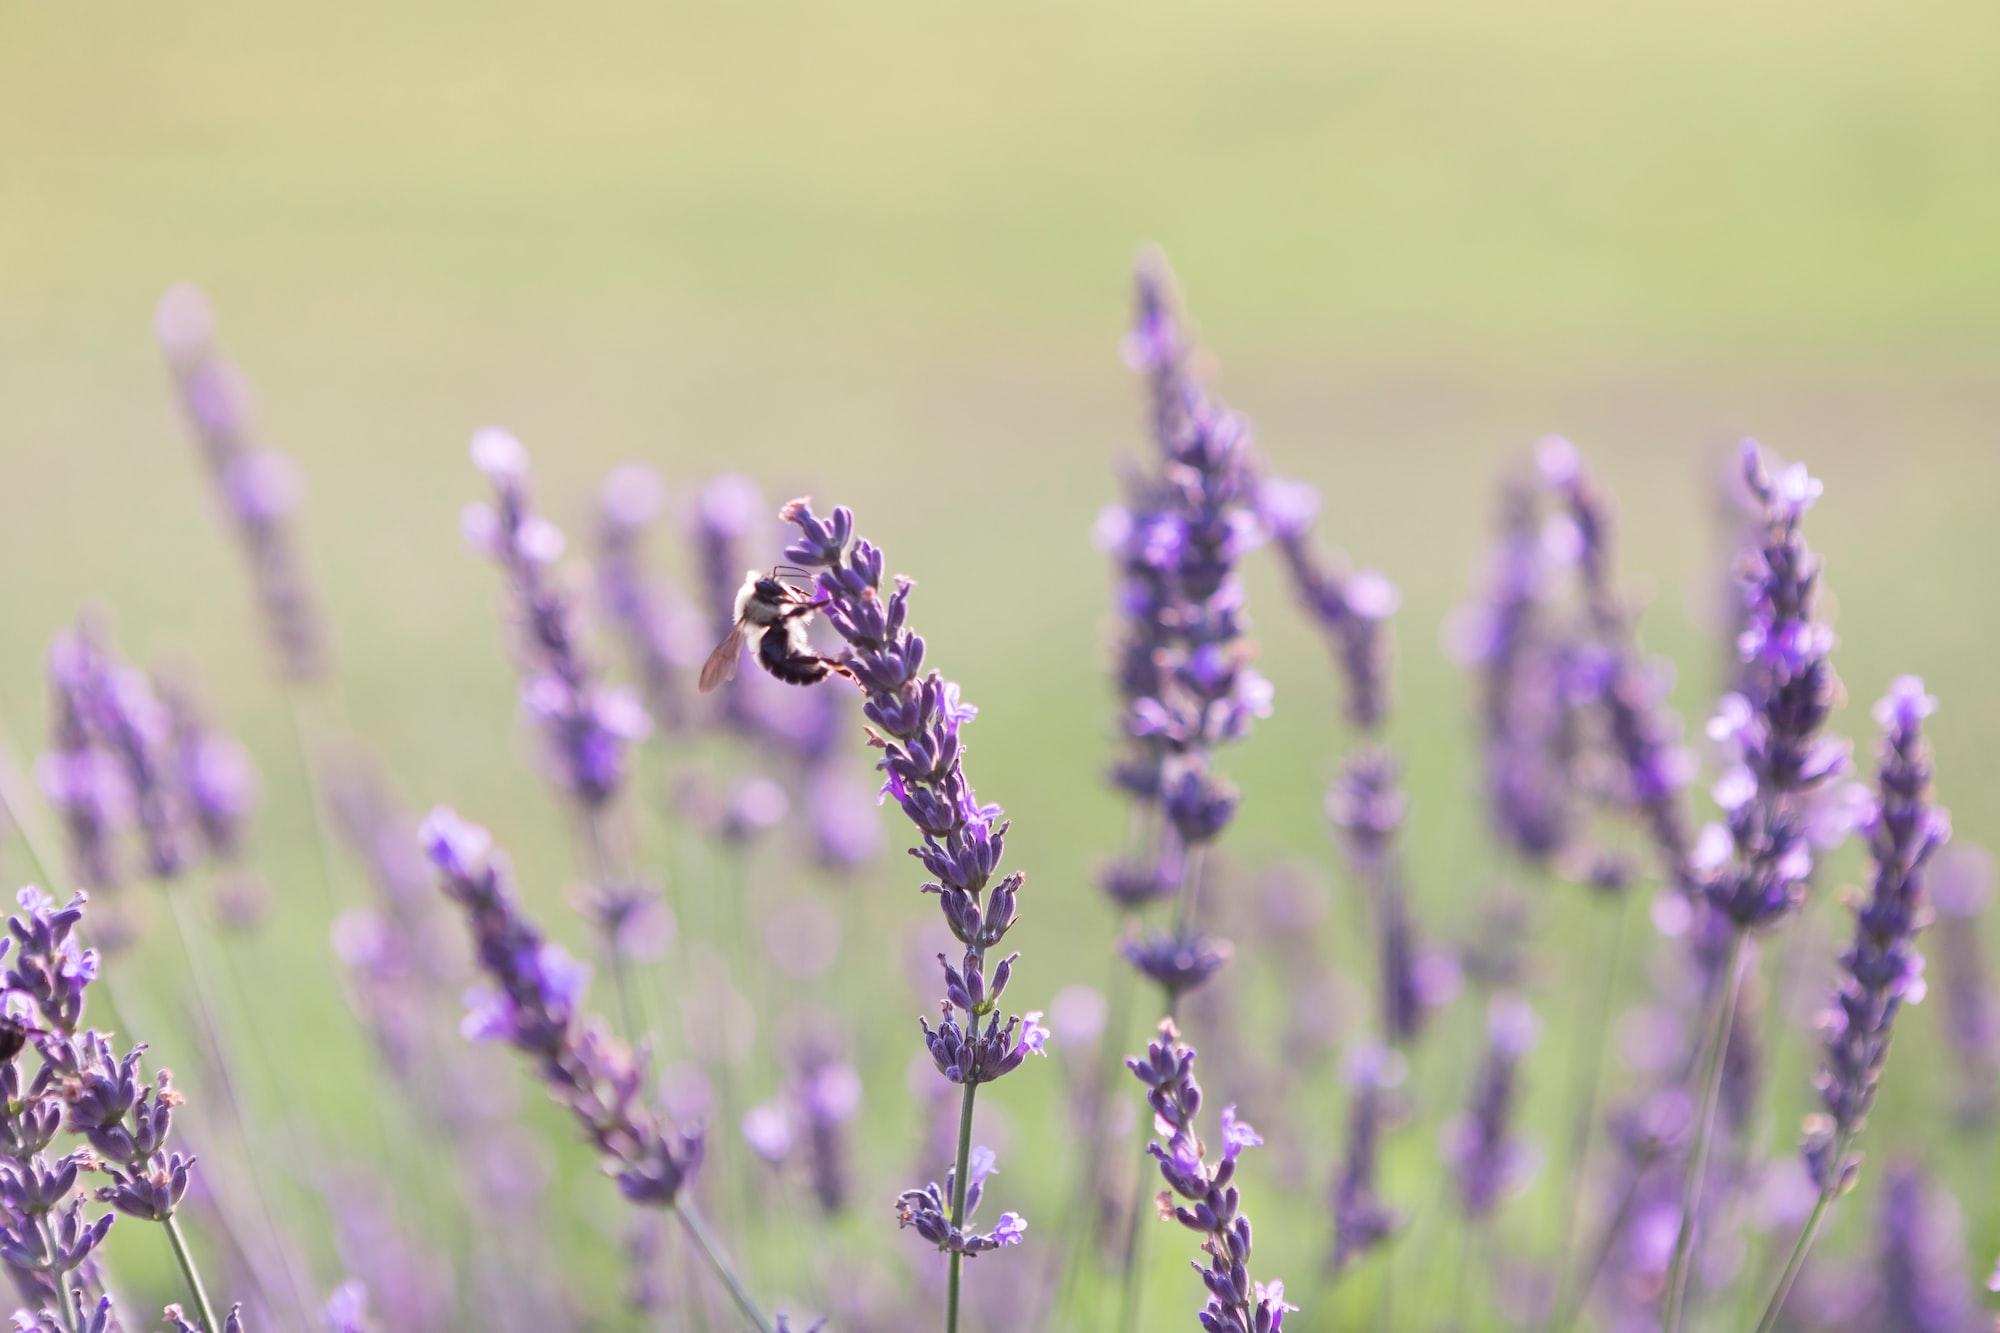 A honey bee pollinating a purple lavender flower | Check out my blog: matthewtrader.com/unsplash